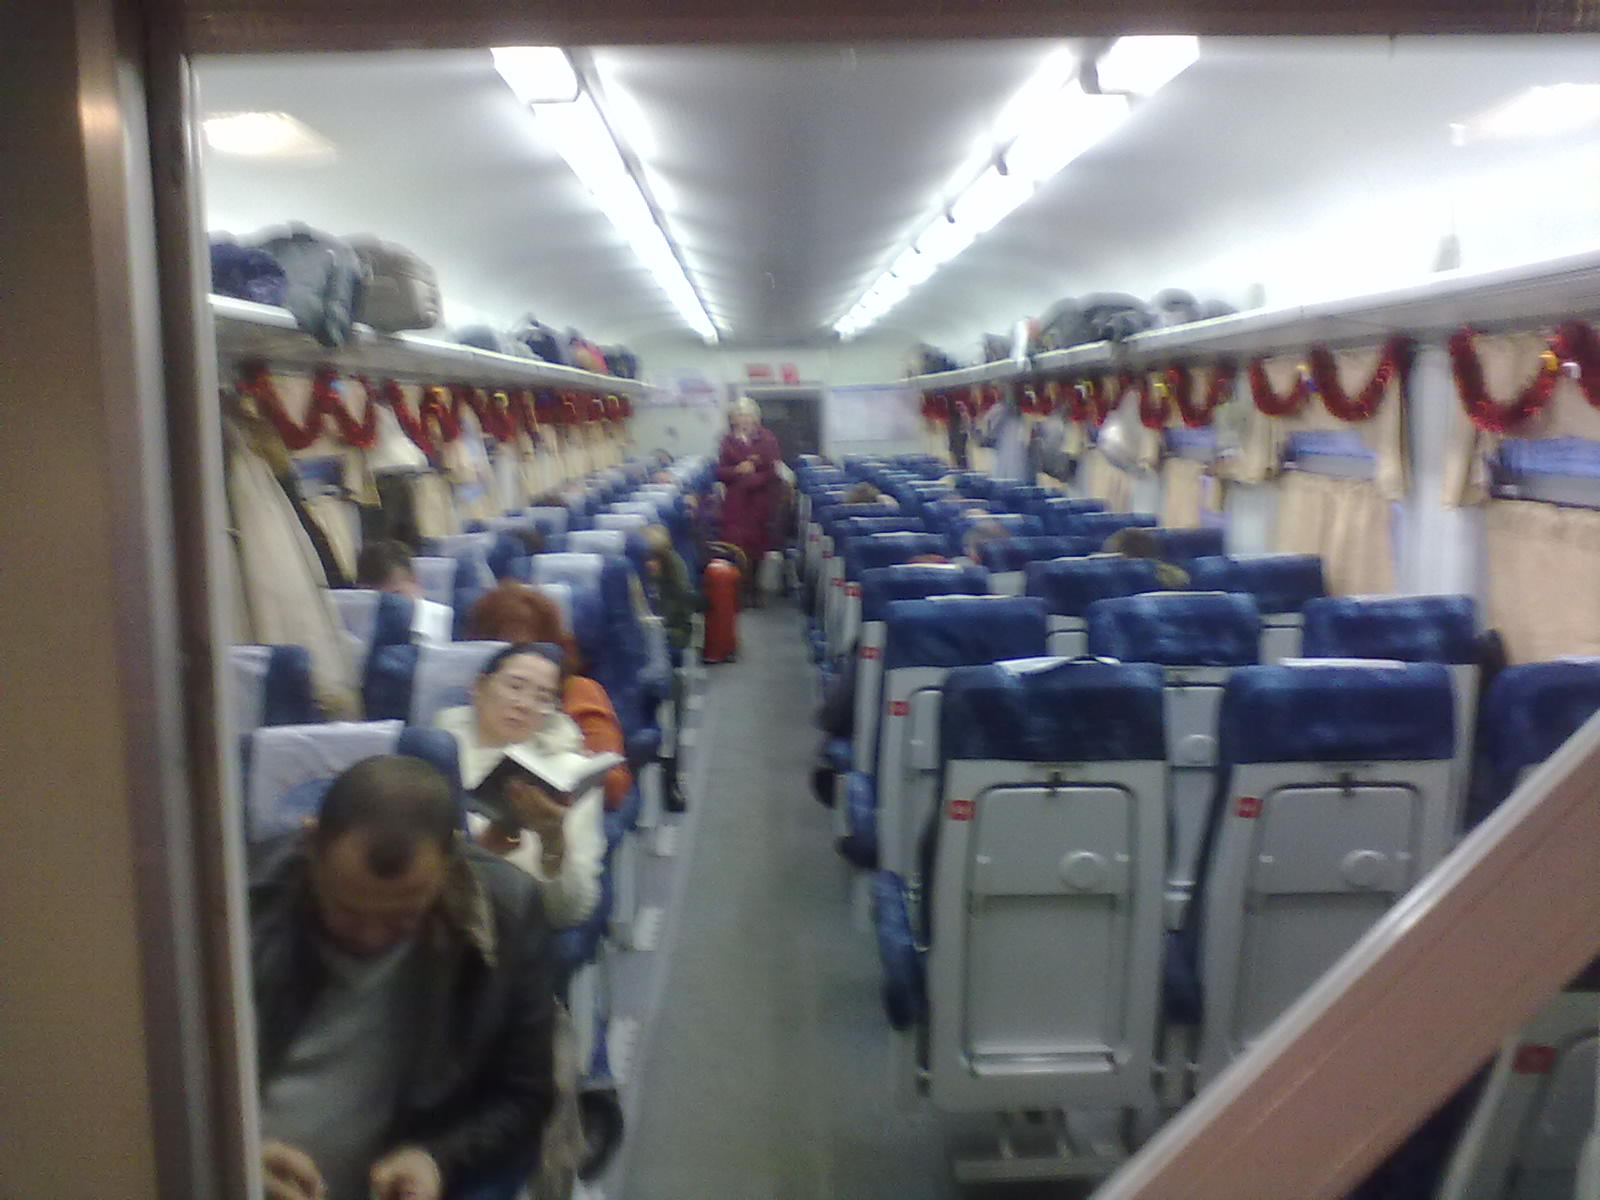 7081и. 7097г москва калуга мжа (rail-club. Ru).